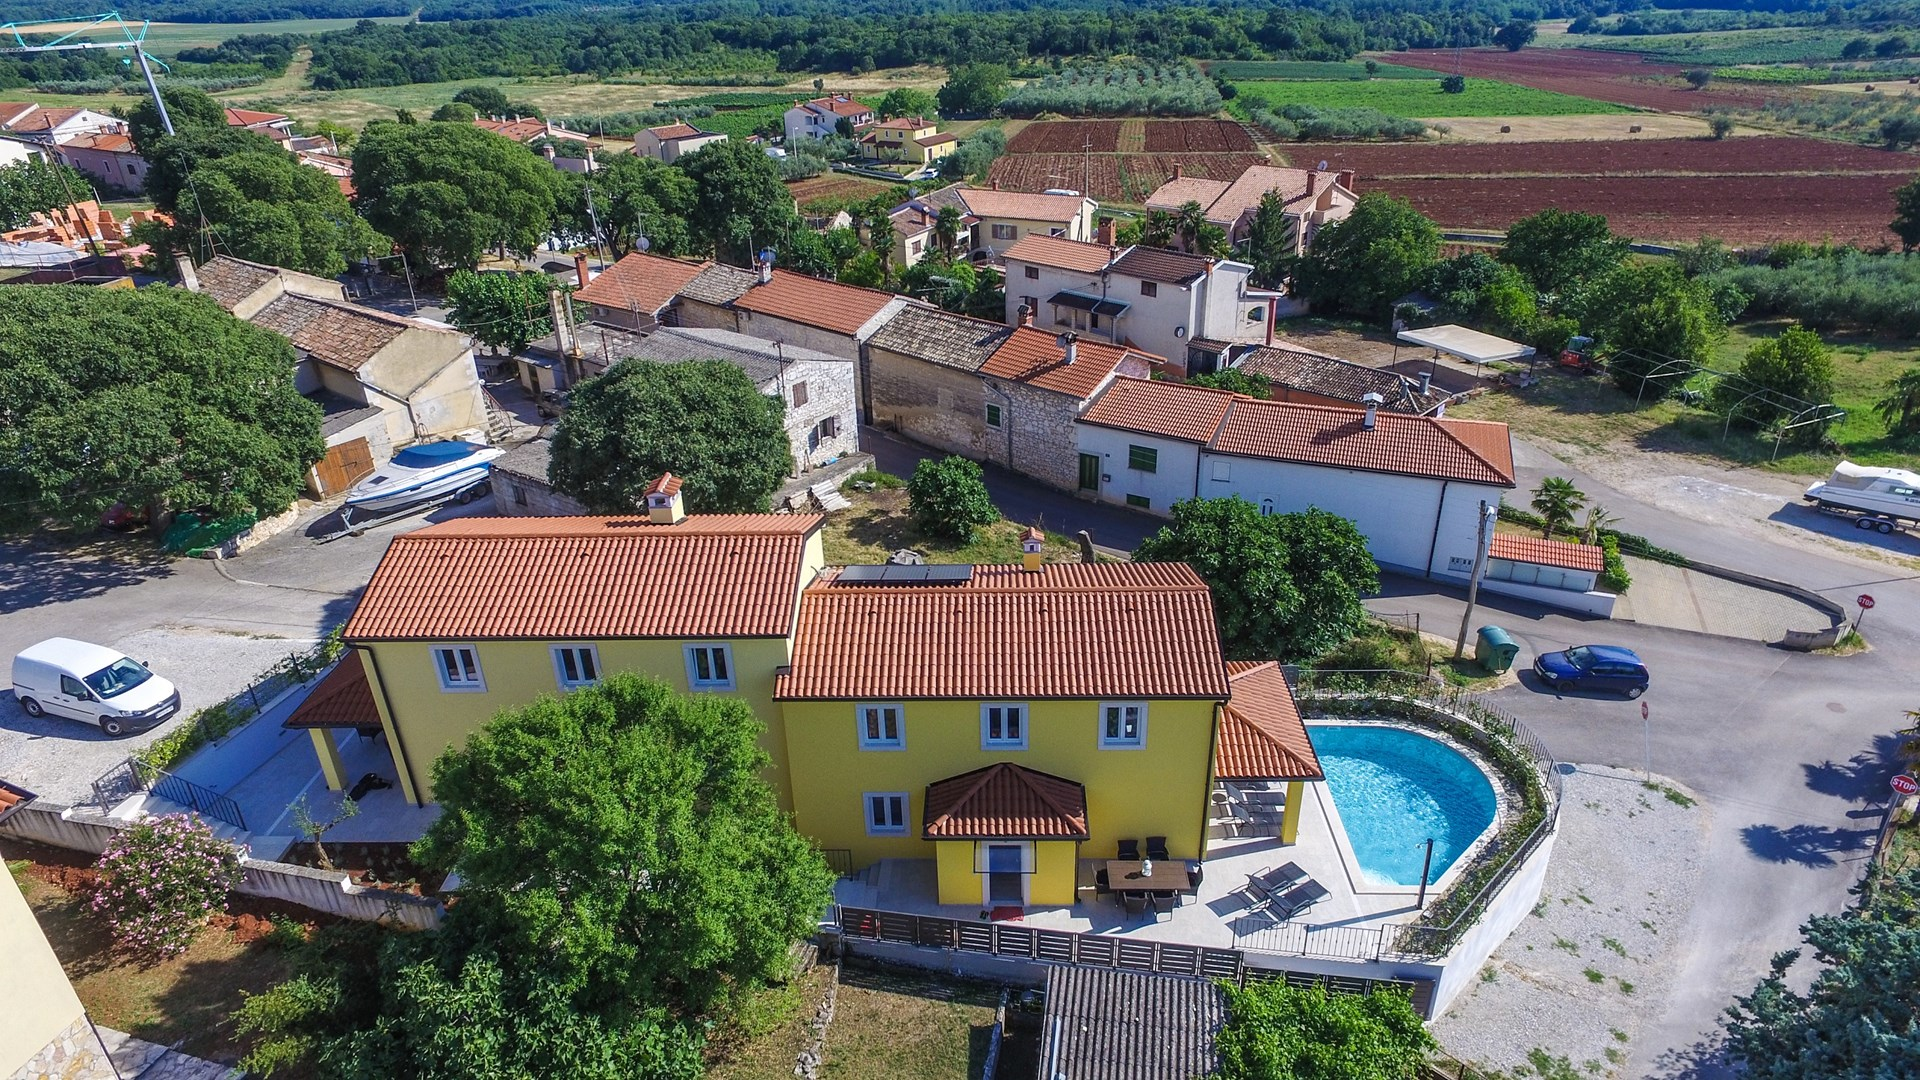 Ferienhaus Villa Albina mit privatem Pool in der Nähe von Aquacolors (2240246), Mugeba, , Istrien, Kroatien, Bild 1